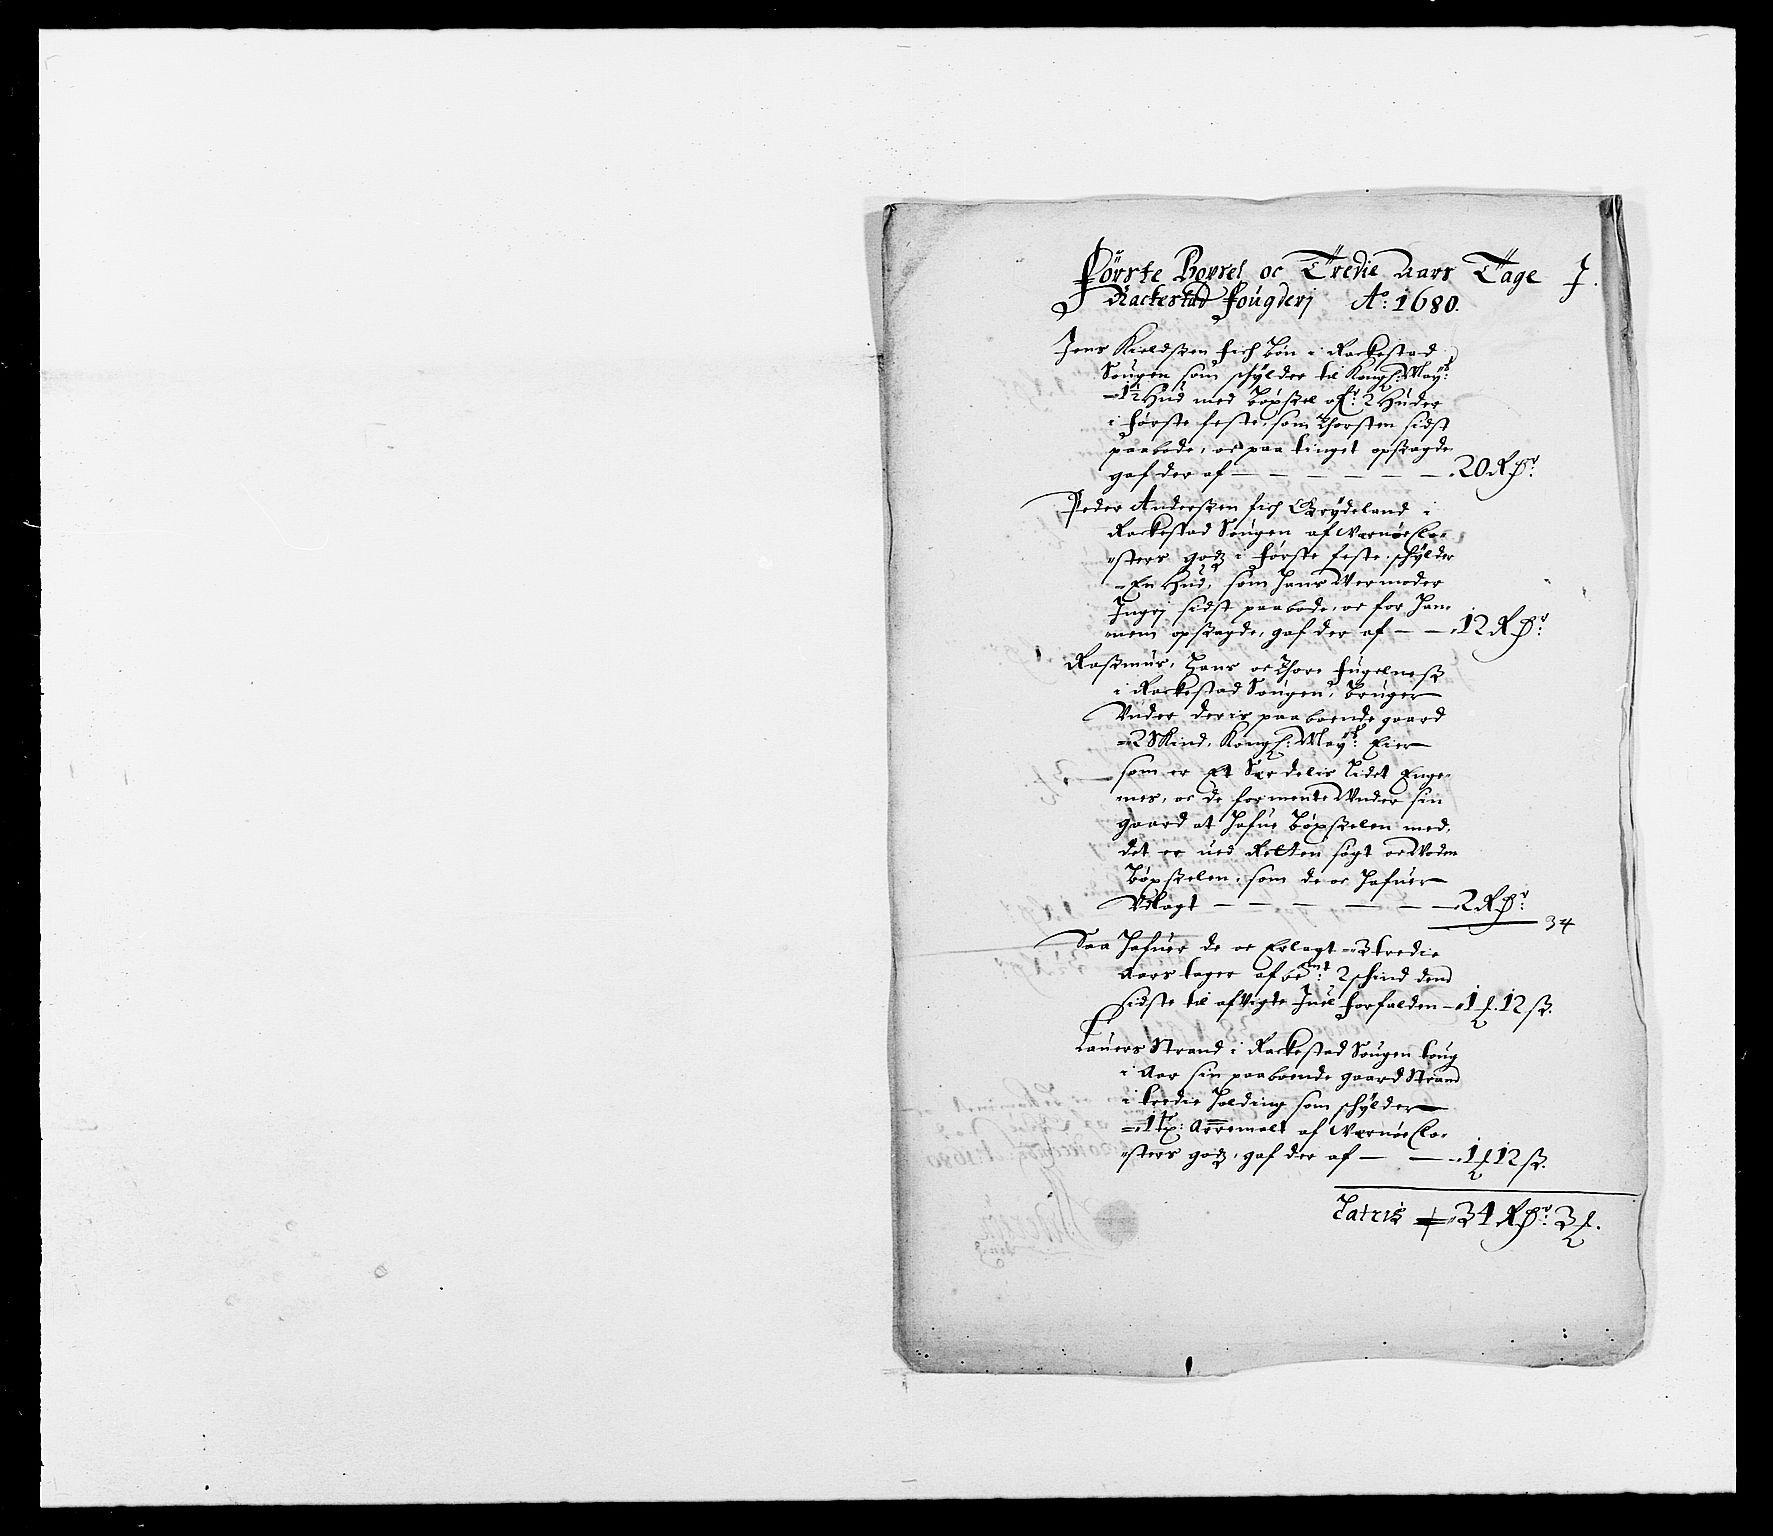 RA, Rentekammeret inntil 1814, Reviderte regnskaper, Fogderegnskap, R05/L0272: Fogderegnskap Rakkestad, 1680-1681, s. 78